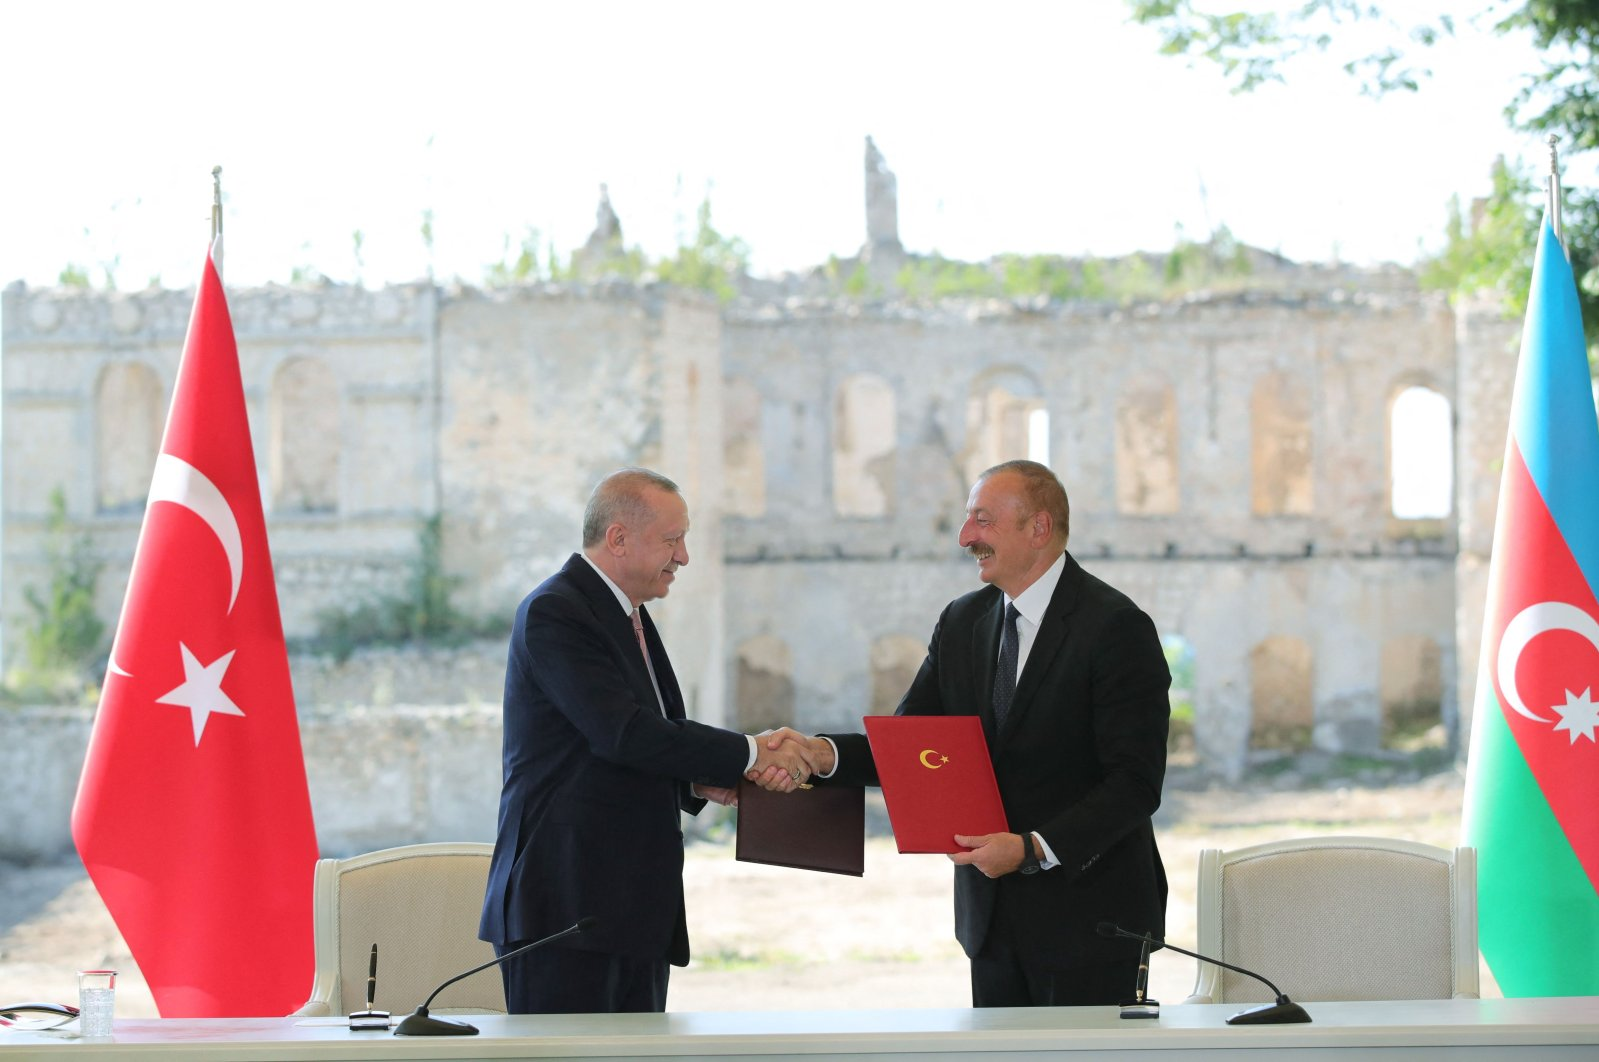 Turkish President Recep Tayyip Erdoğan (L) and Azerbaijani President Ilham Aliyev (R) shake hands after signing the Shusha Declaration in Shusha, Nagorno-Karabakh, Azerbaijan, June 15, 2021. (Turkish Presidential Press Office via AFP)